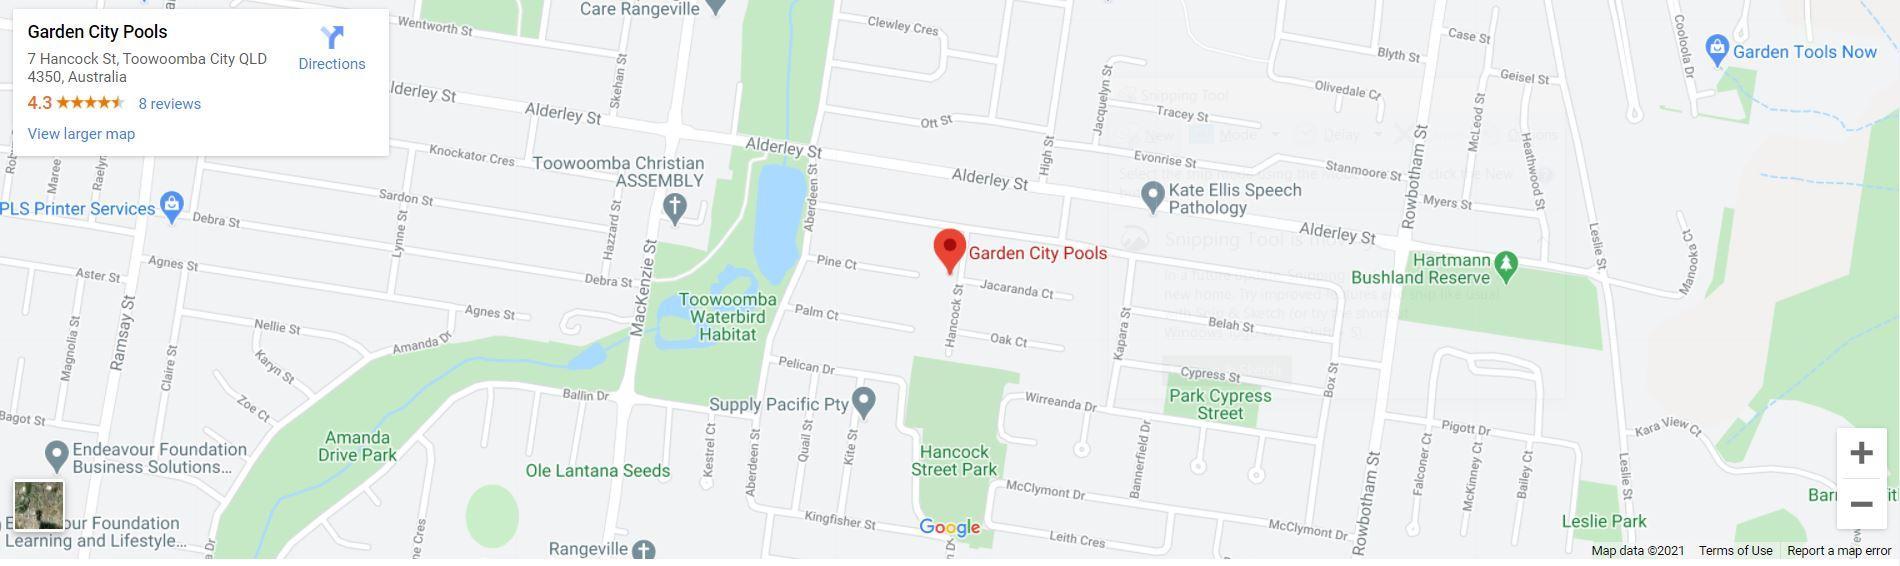 Garden City Pools Map Toowoomba